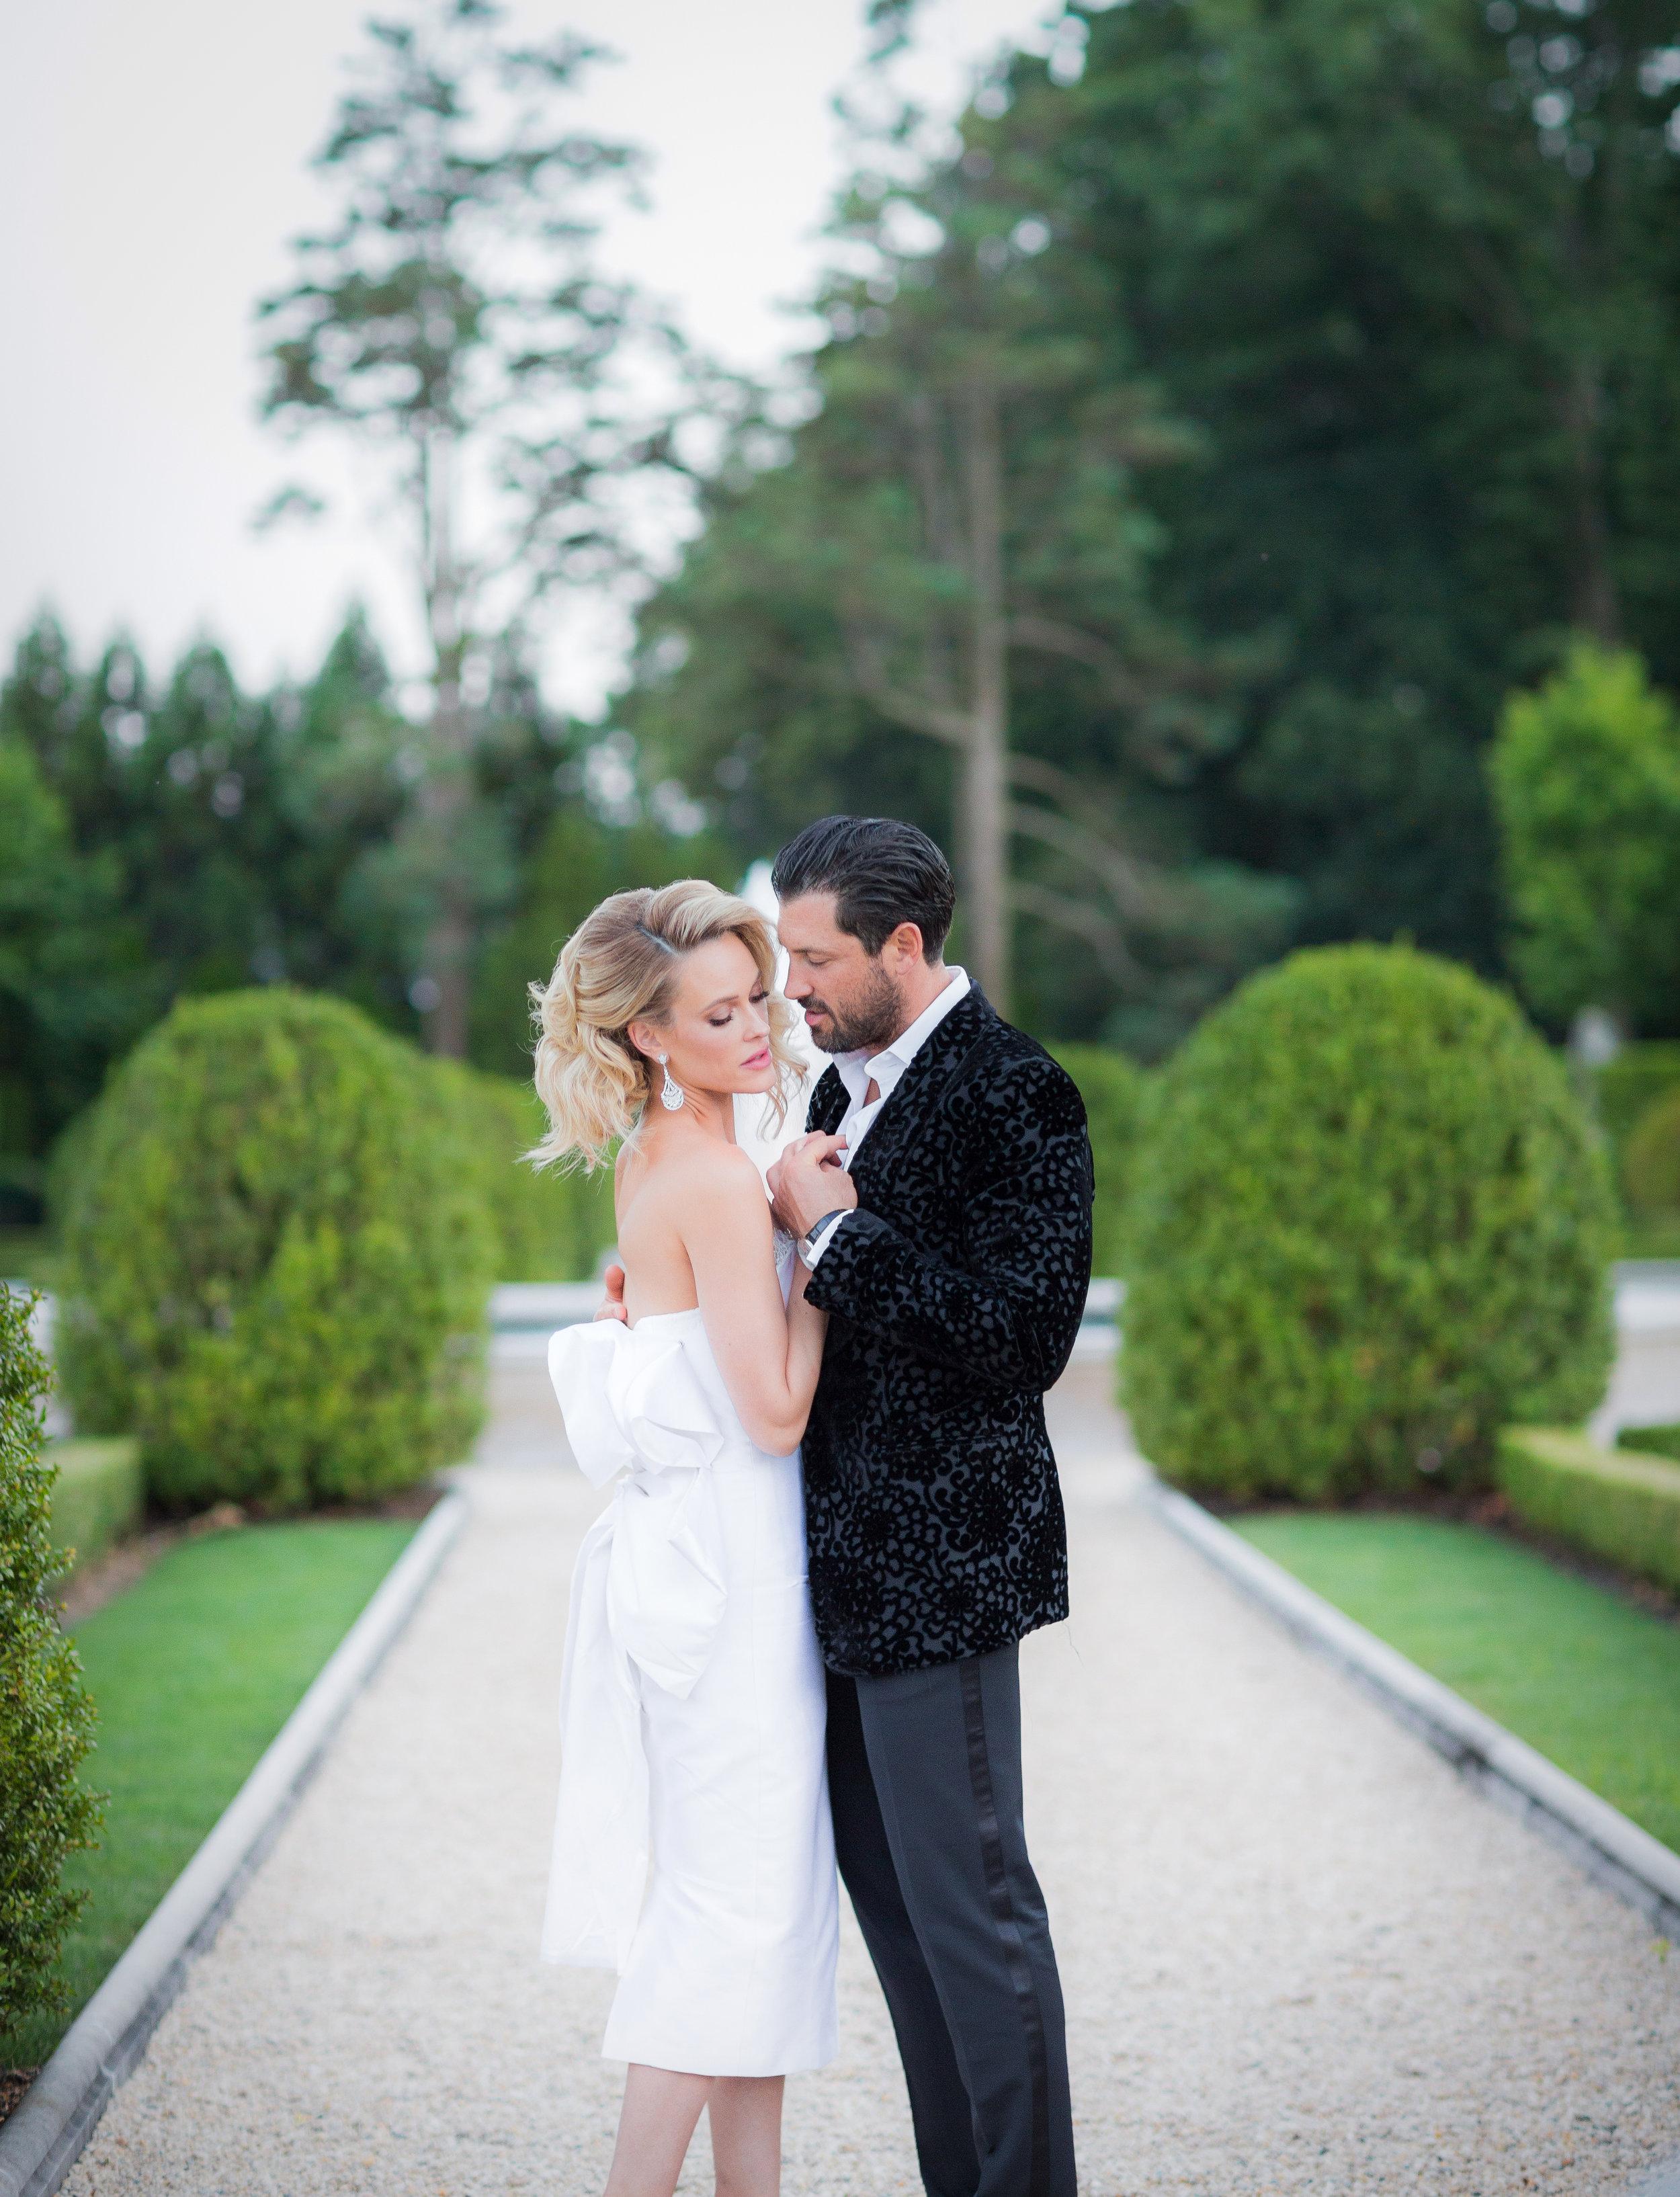 Peta Murgatroyd and Maksim Chmerkovskiy Wedding Jamie Levine Photography Oheka Castle 003.jpg